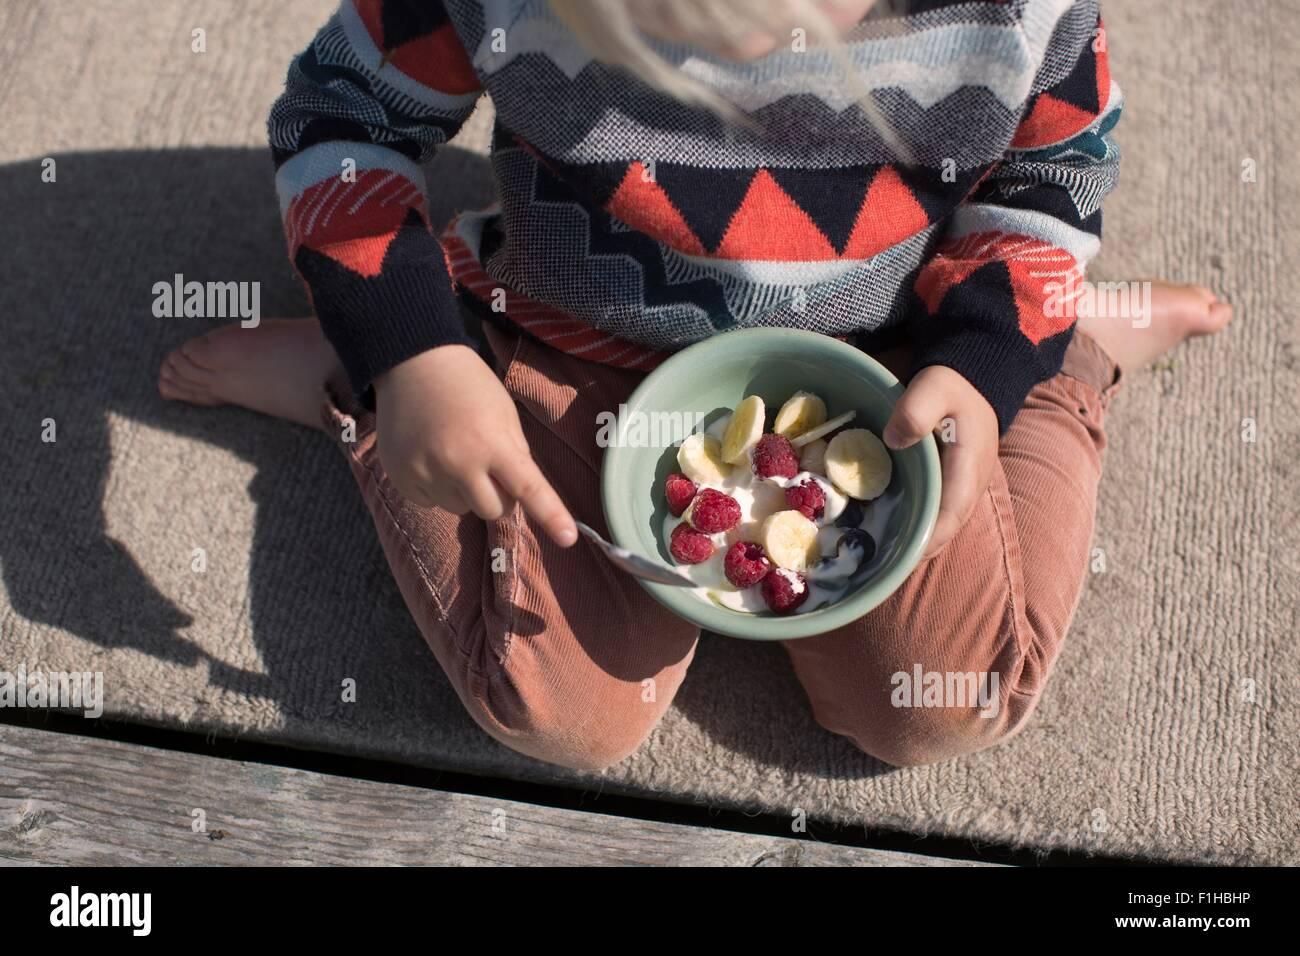 Boy holding bowl of fruit, high angle Stock Photo